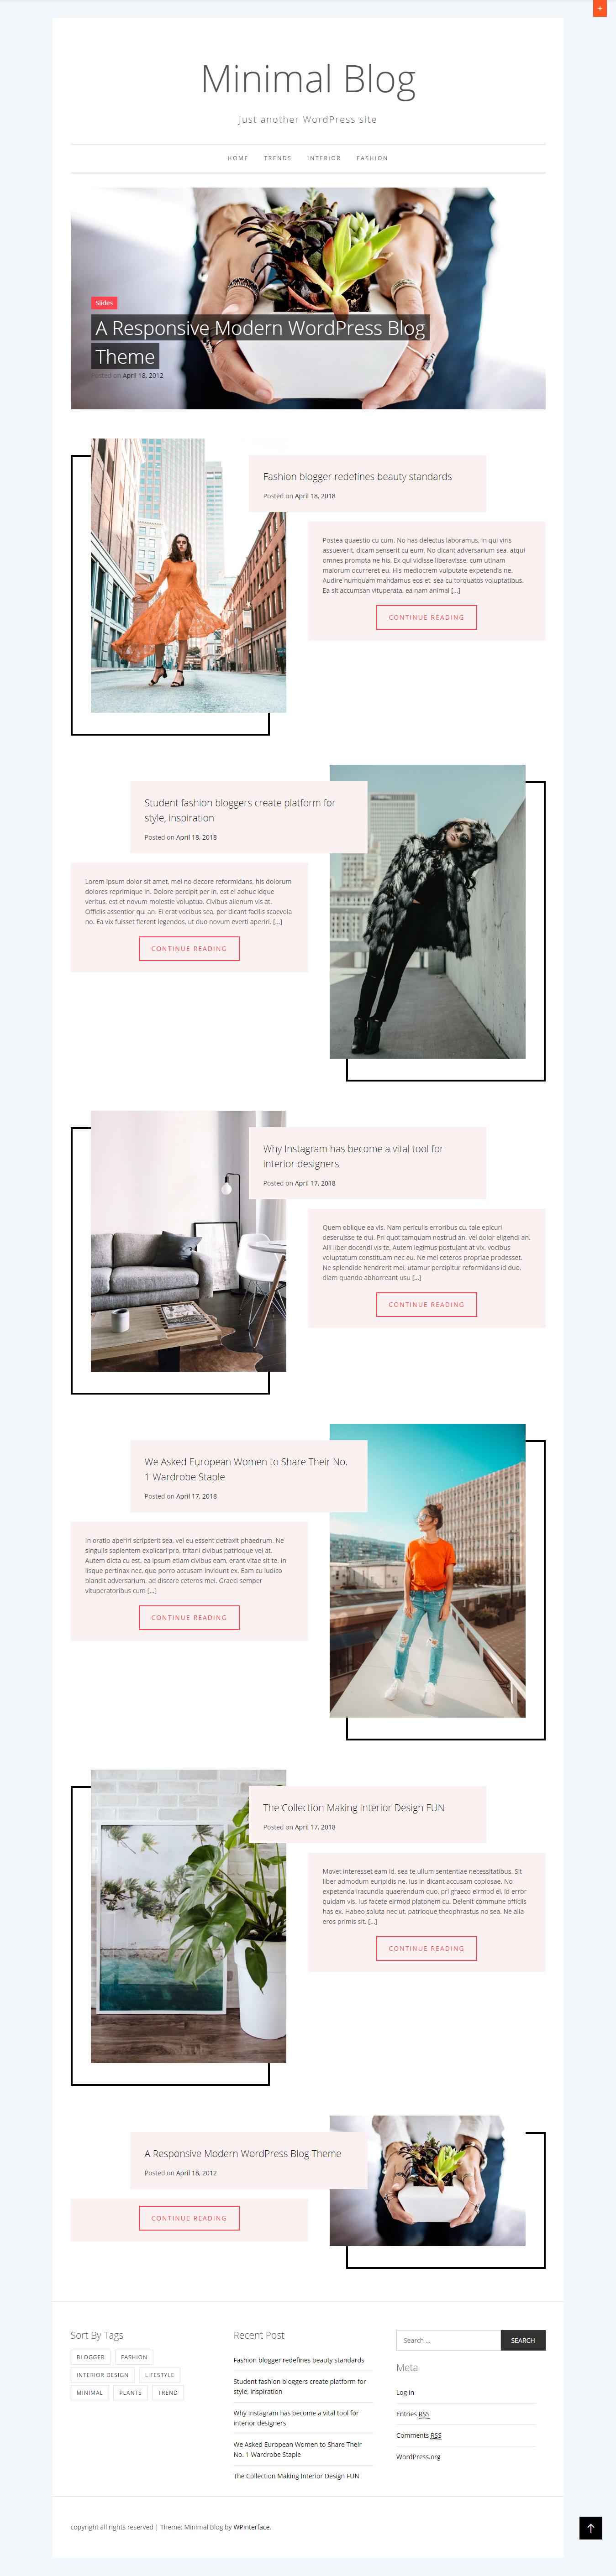 Minimal Blog - Best Free Minimal WordPress Theme